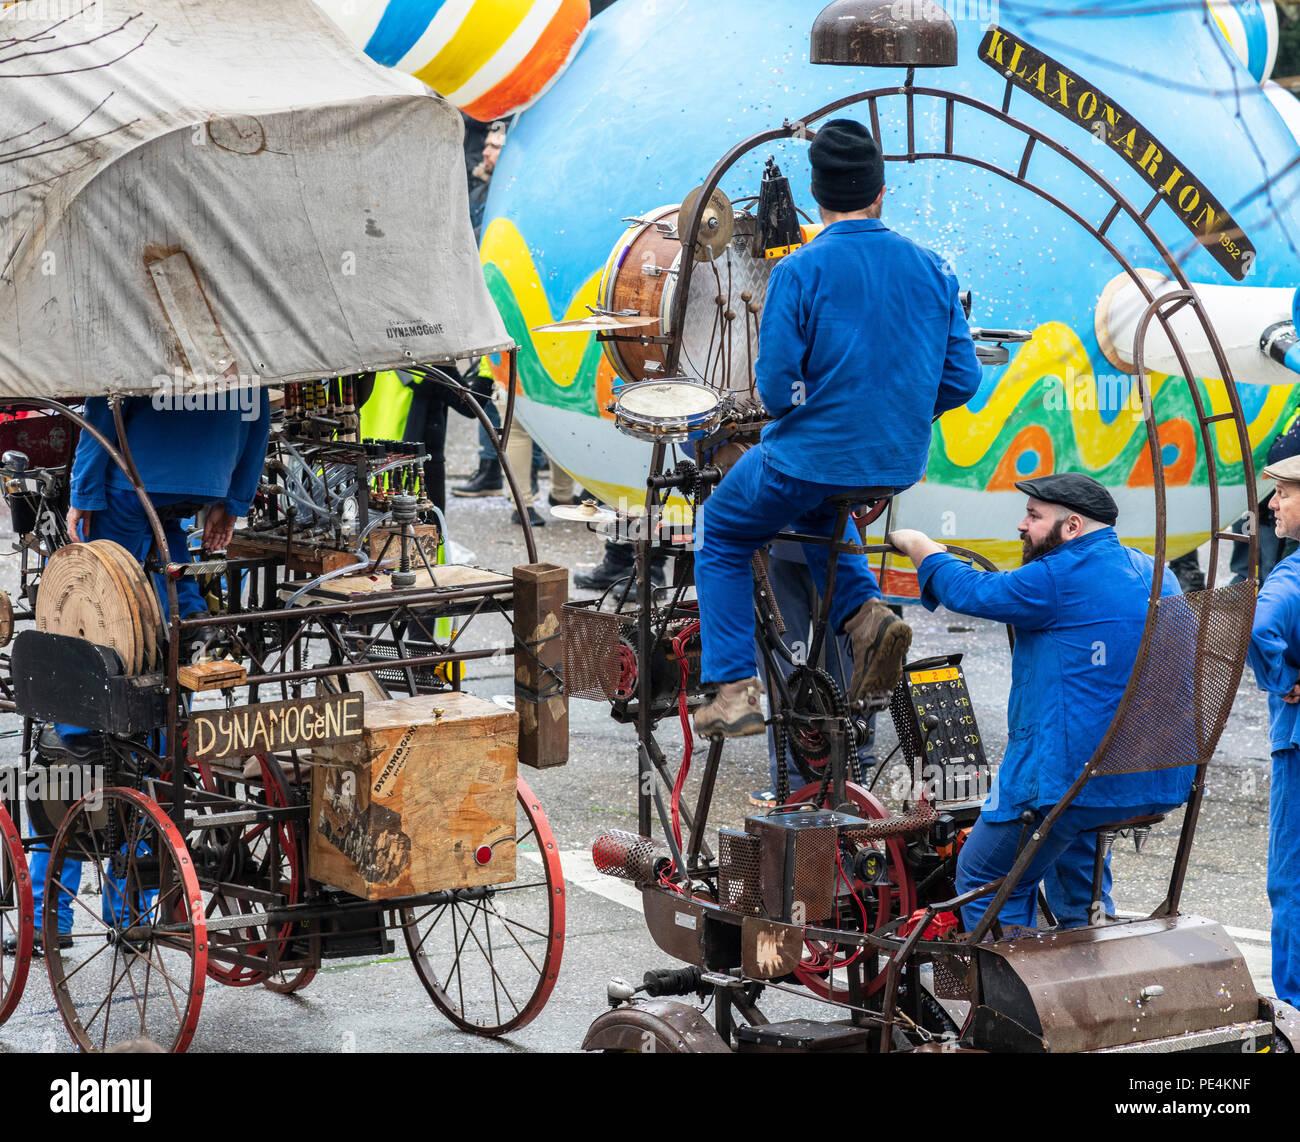 1952 Klaxonarion, mobile dynamogenic musical machine, Strasbourg carnival parade, Alsace, France, Europe, - Stock Image